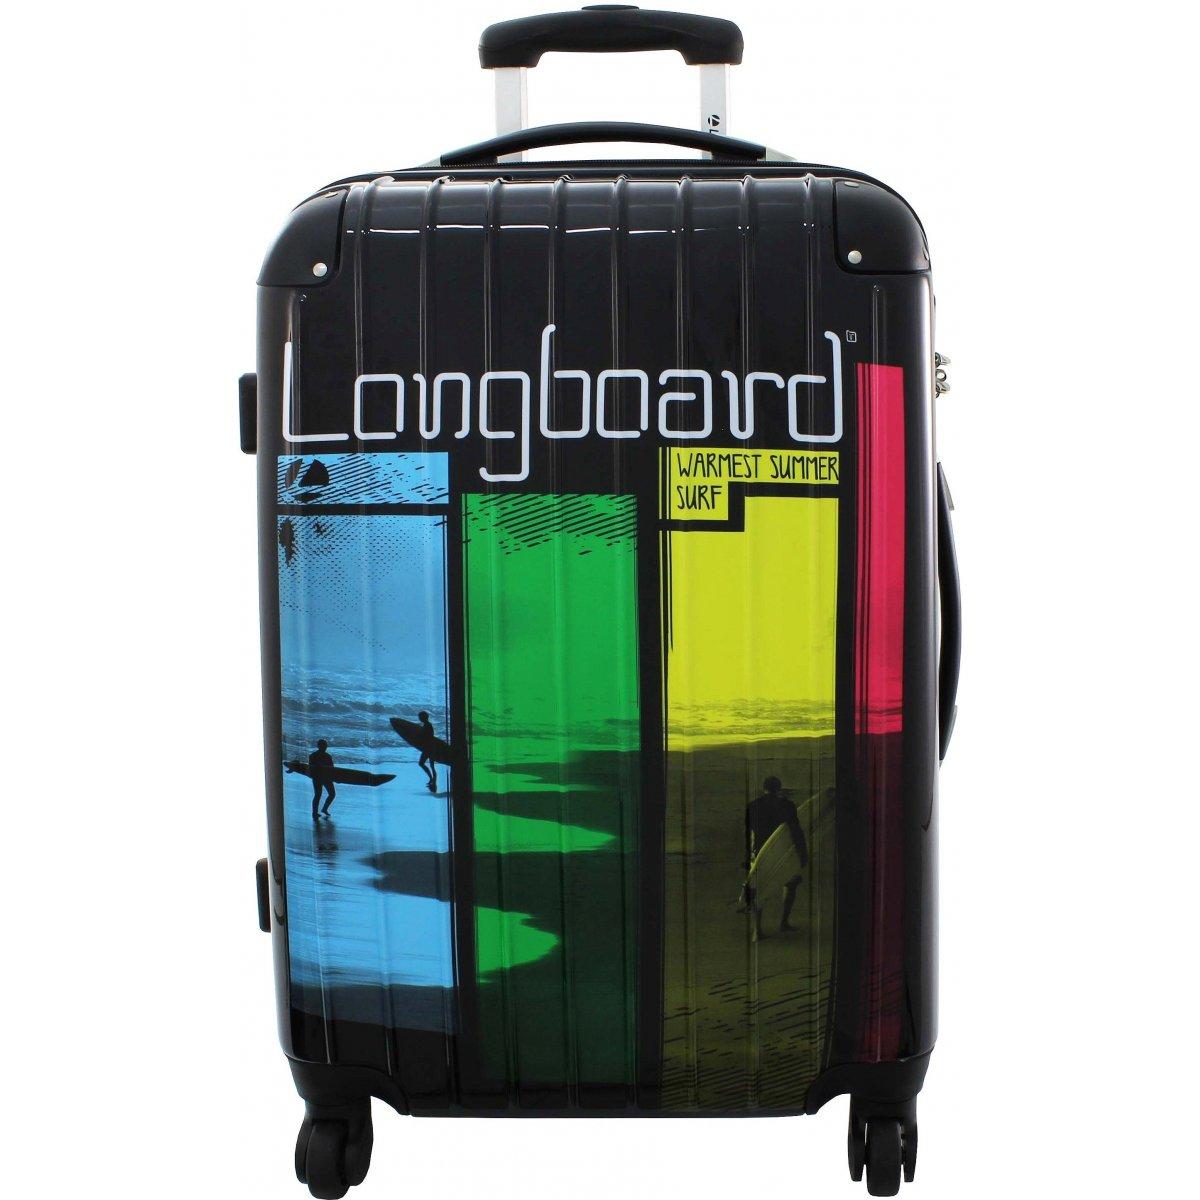 lot 3 valises longboard 441014 couleur principale noir promotion. Black Bedroom Furniture Sets. Home Design Ideas